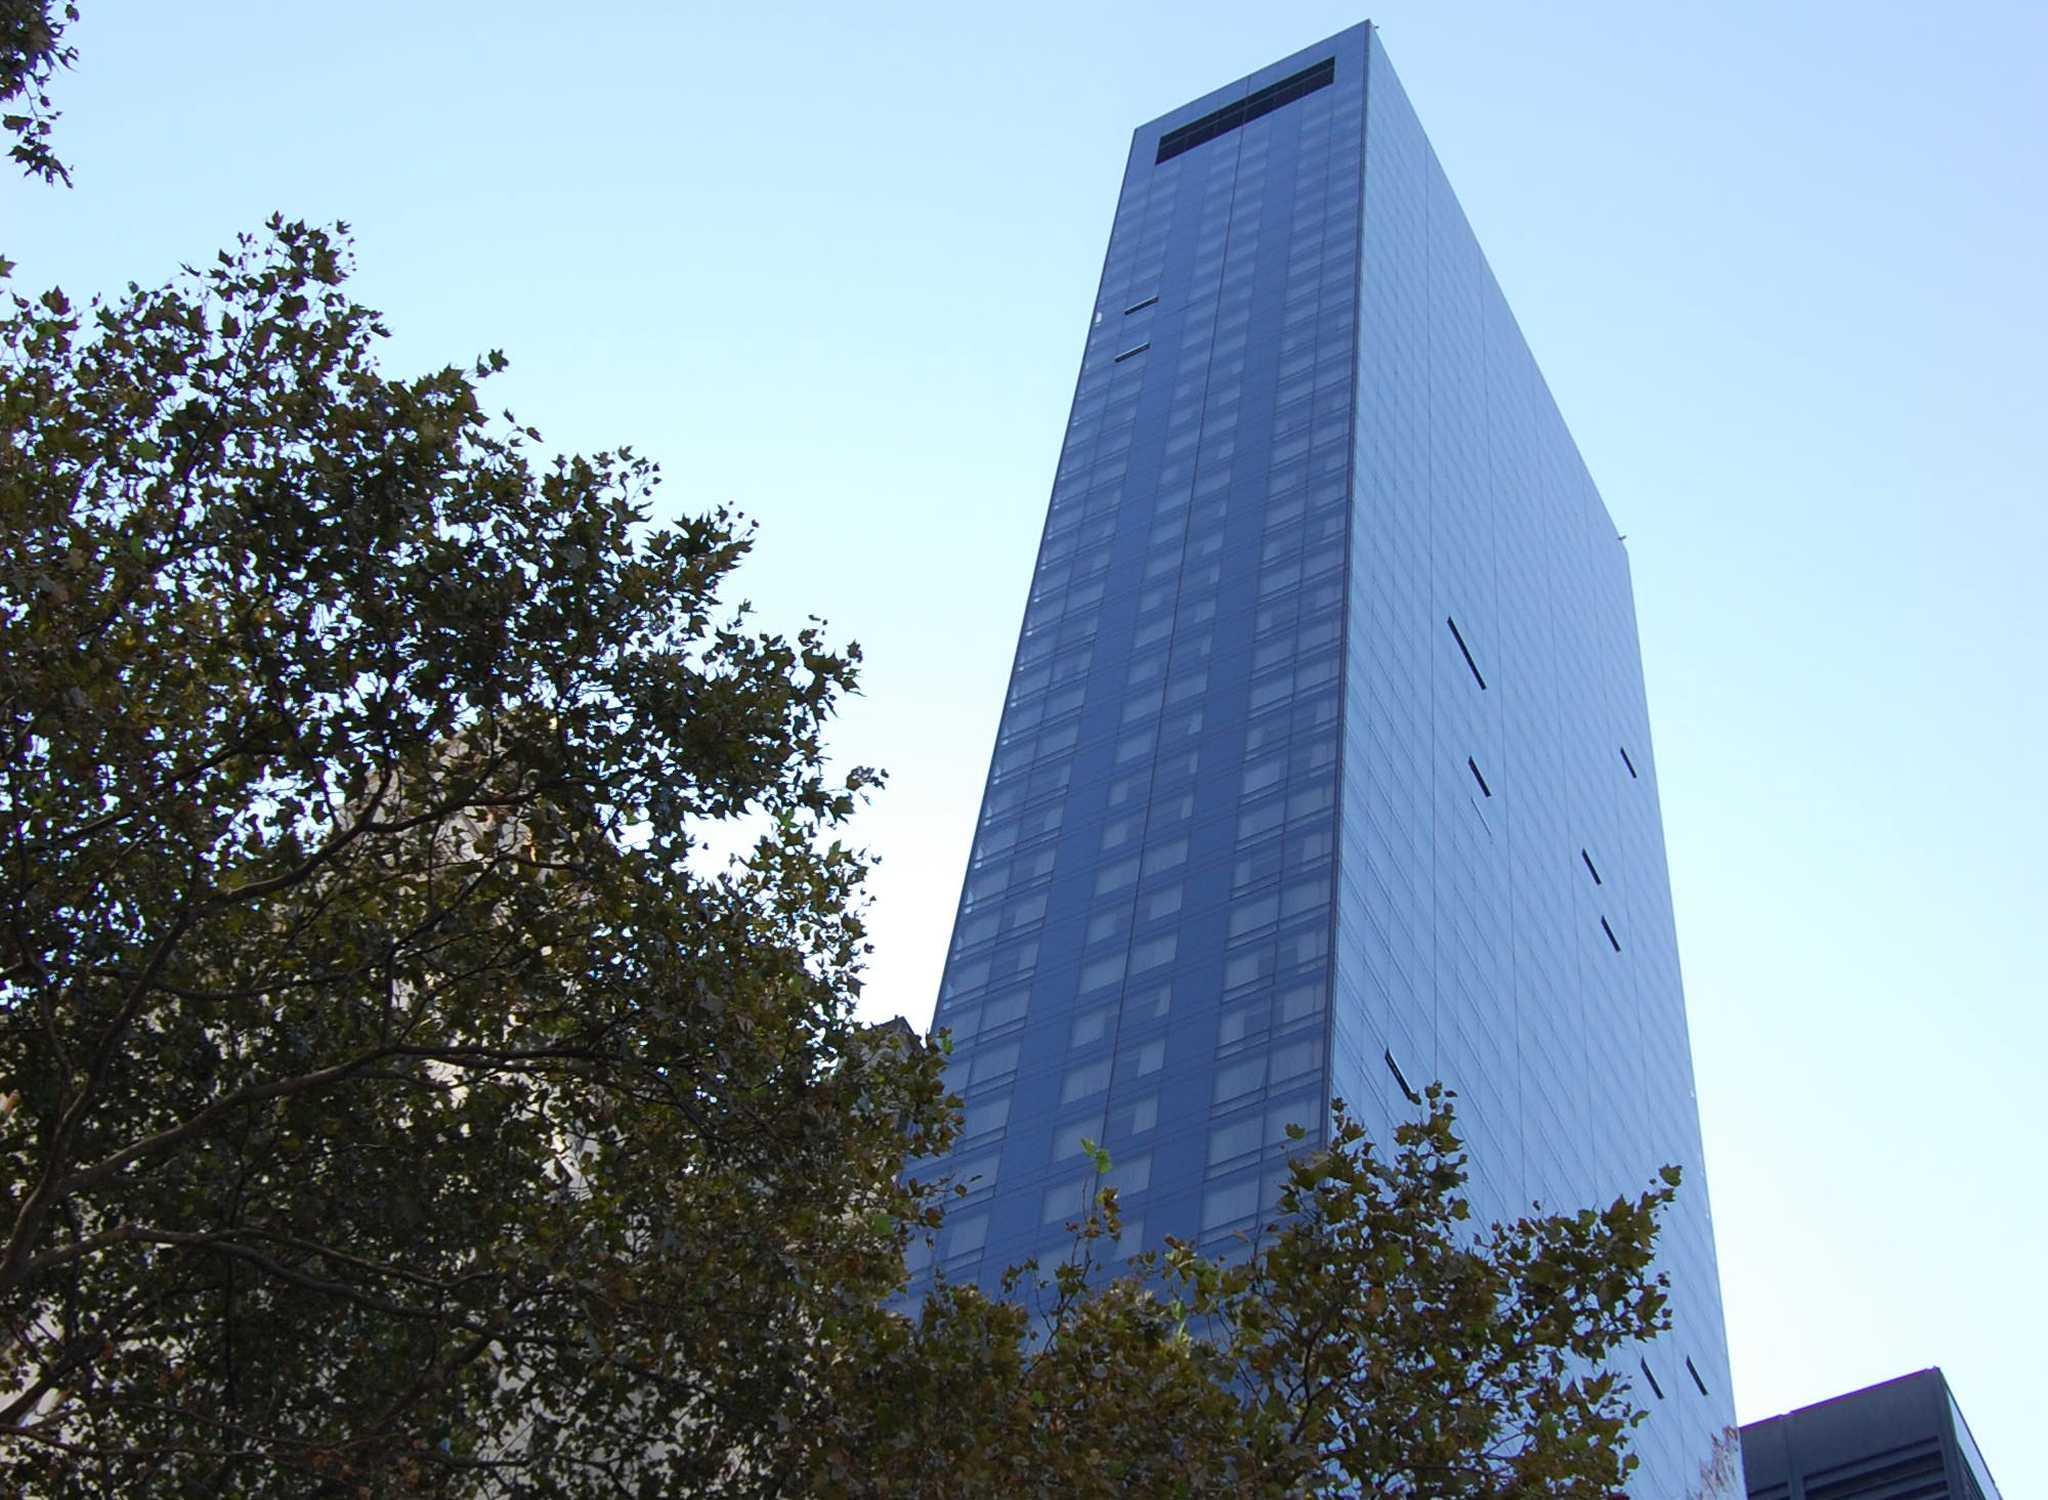 New york monroe county hilton - H Tel Millennium Hilton New York Downtown Vue Ext Rieure